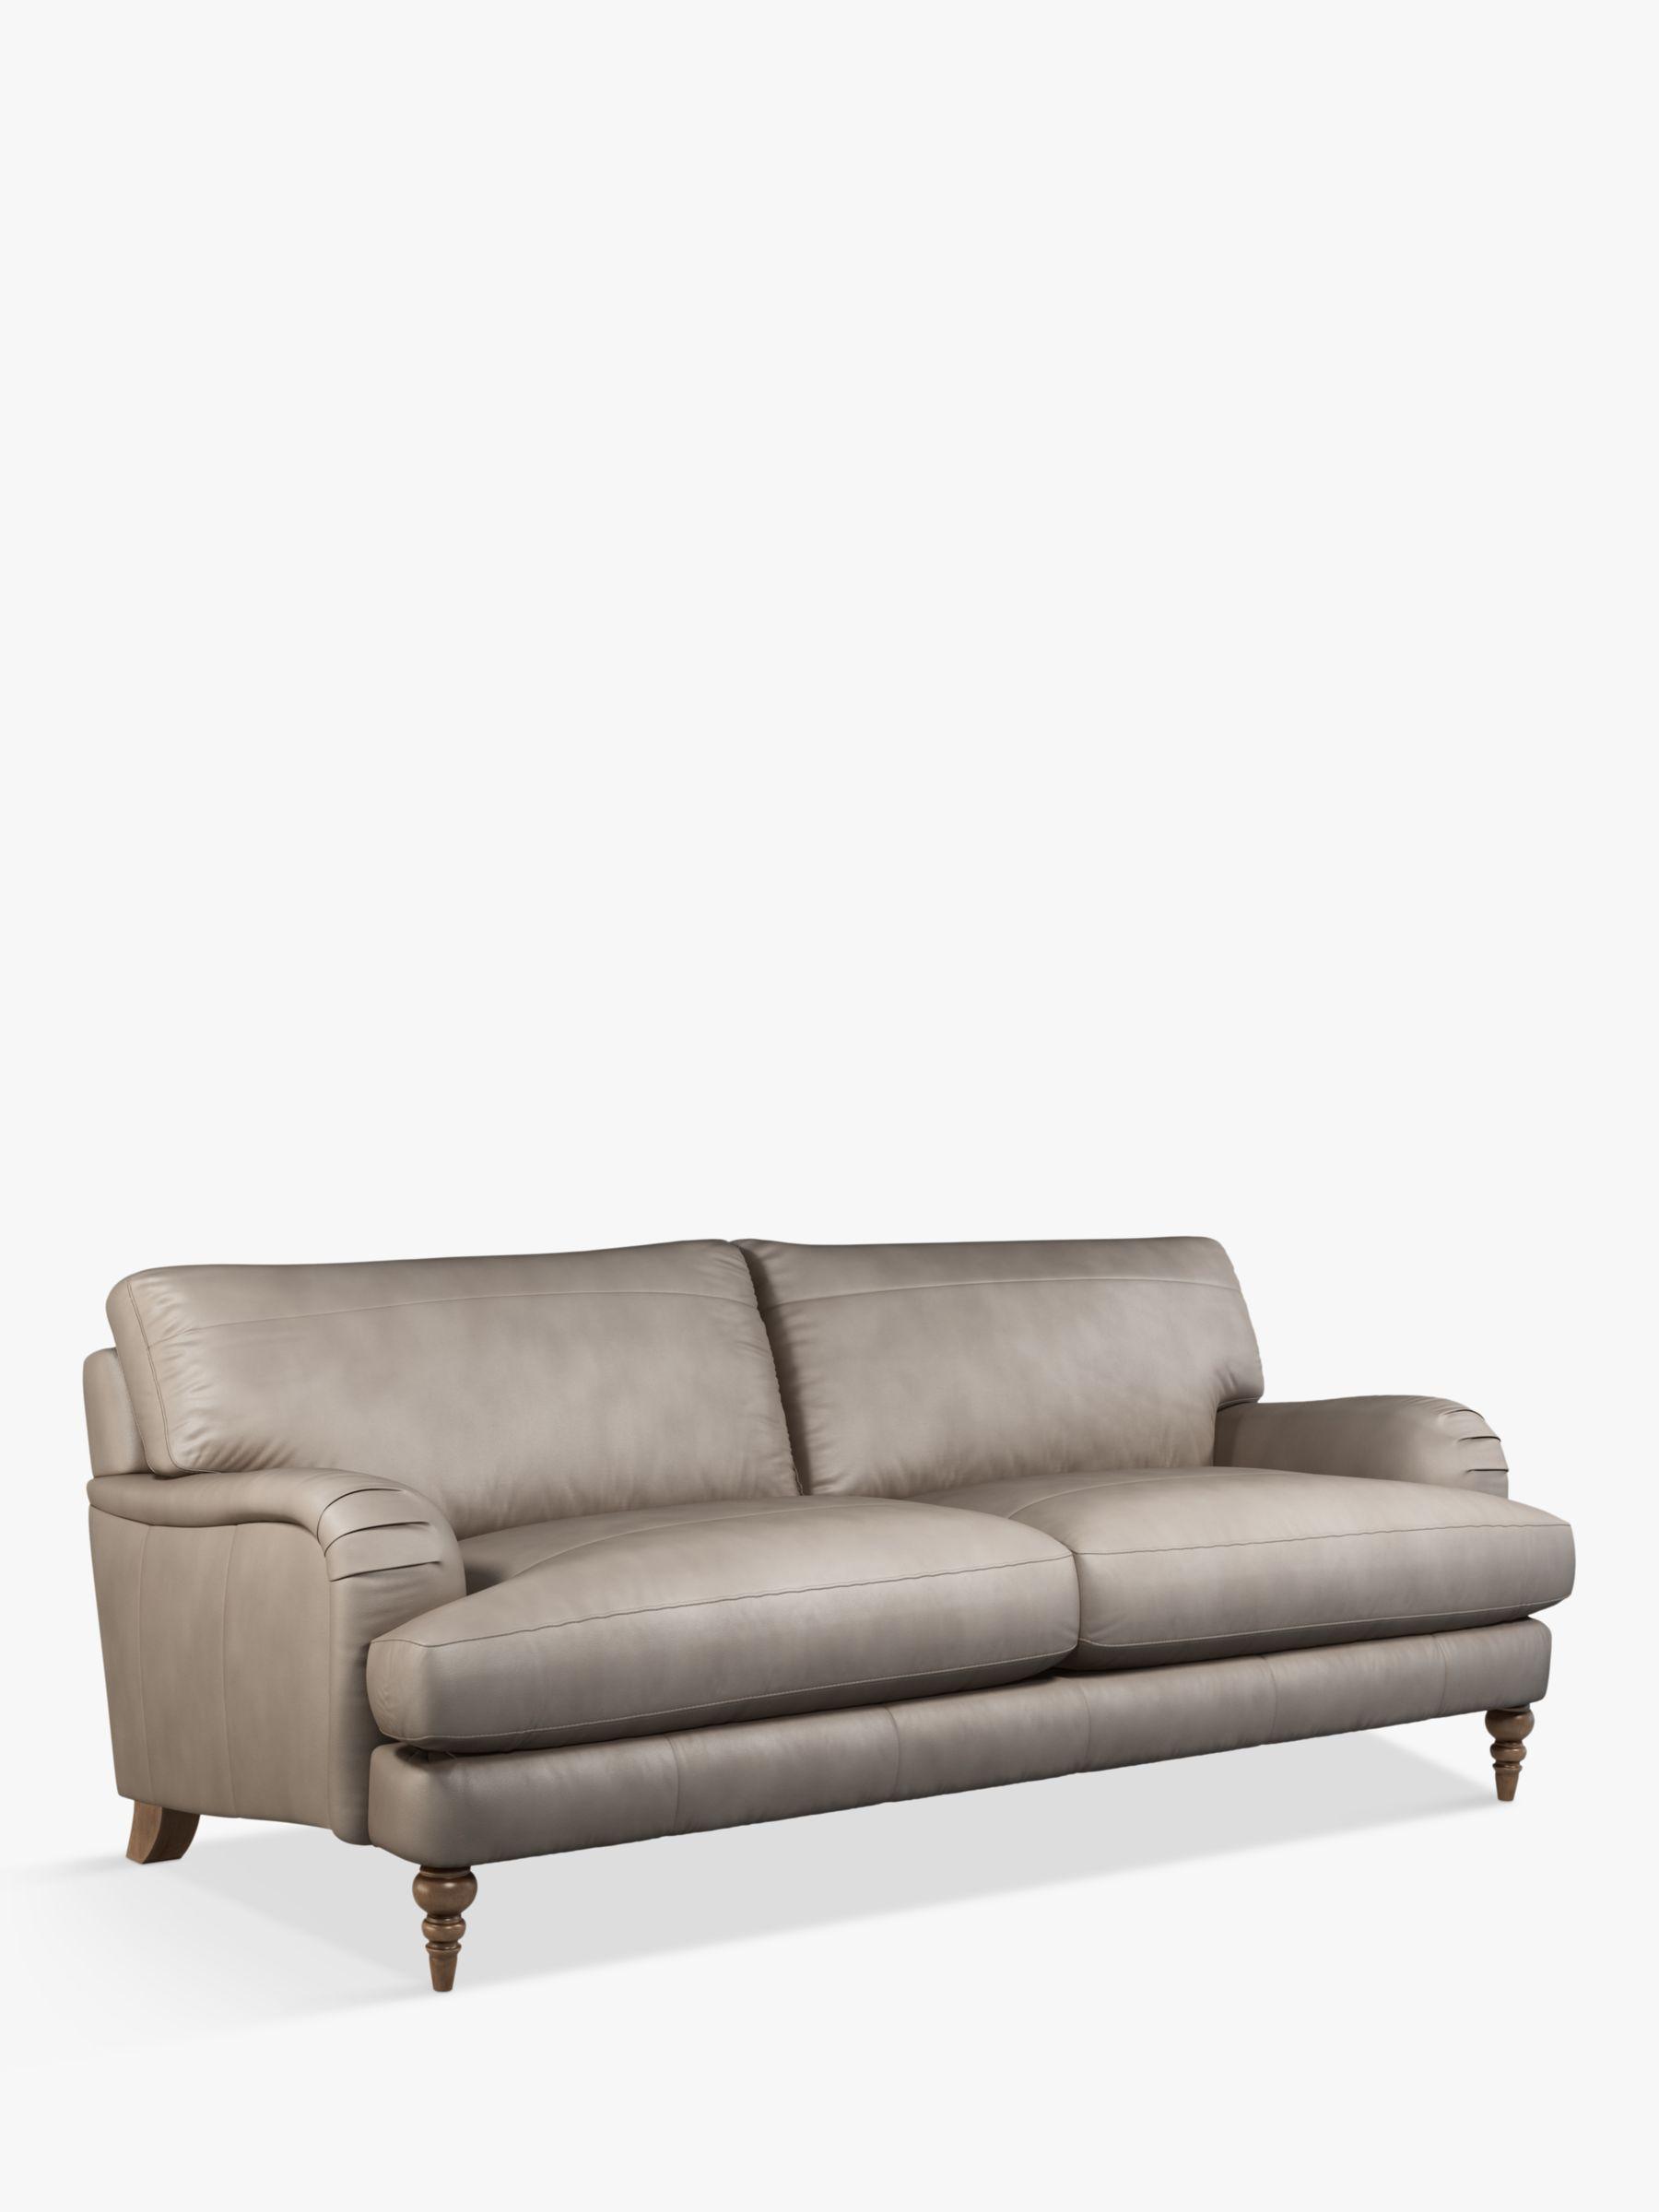 John Lewis & Partners Otley Grand 4 Seater Leather Sofa